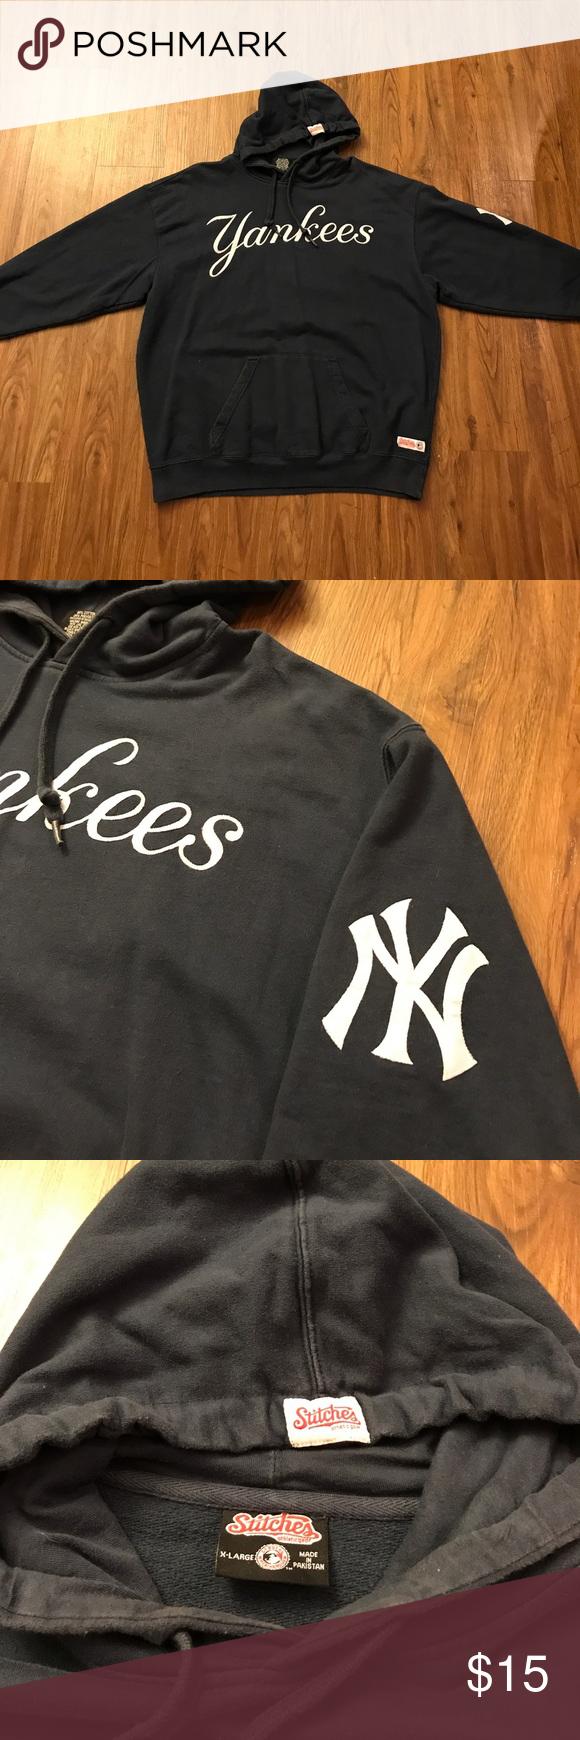 New York Yankees Hoodie Stitches Athletic Gear New York Yankees